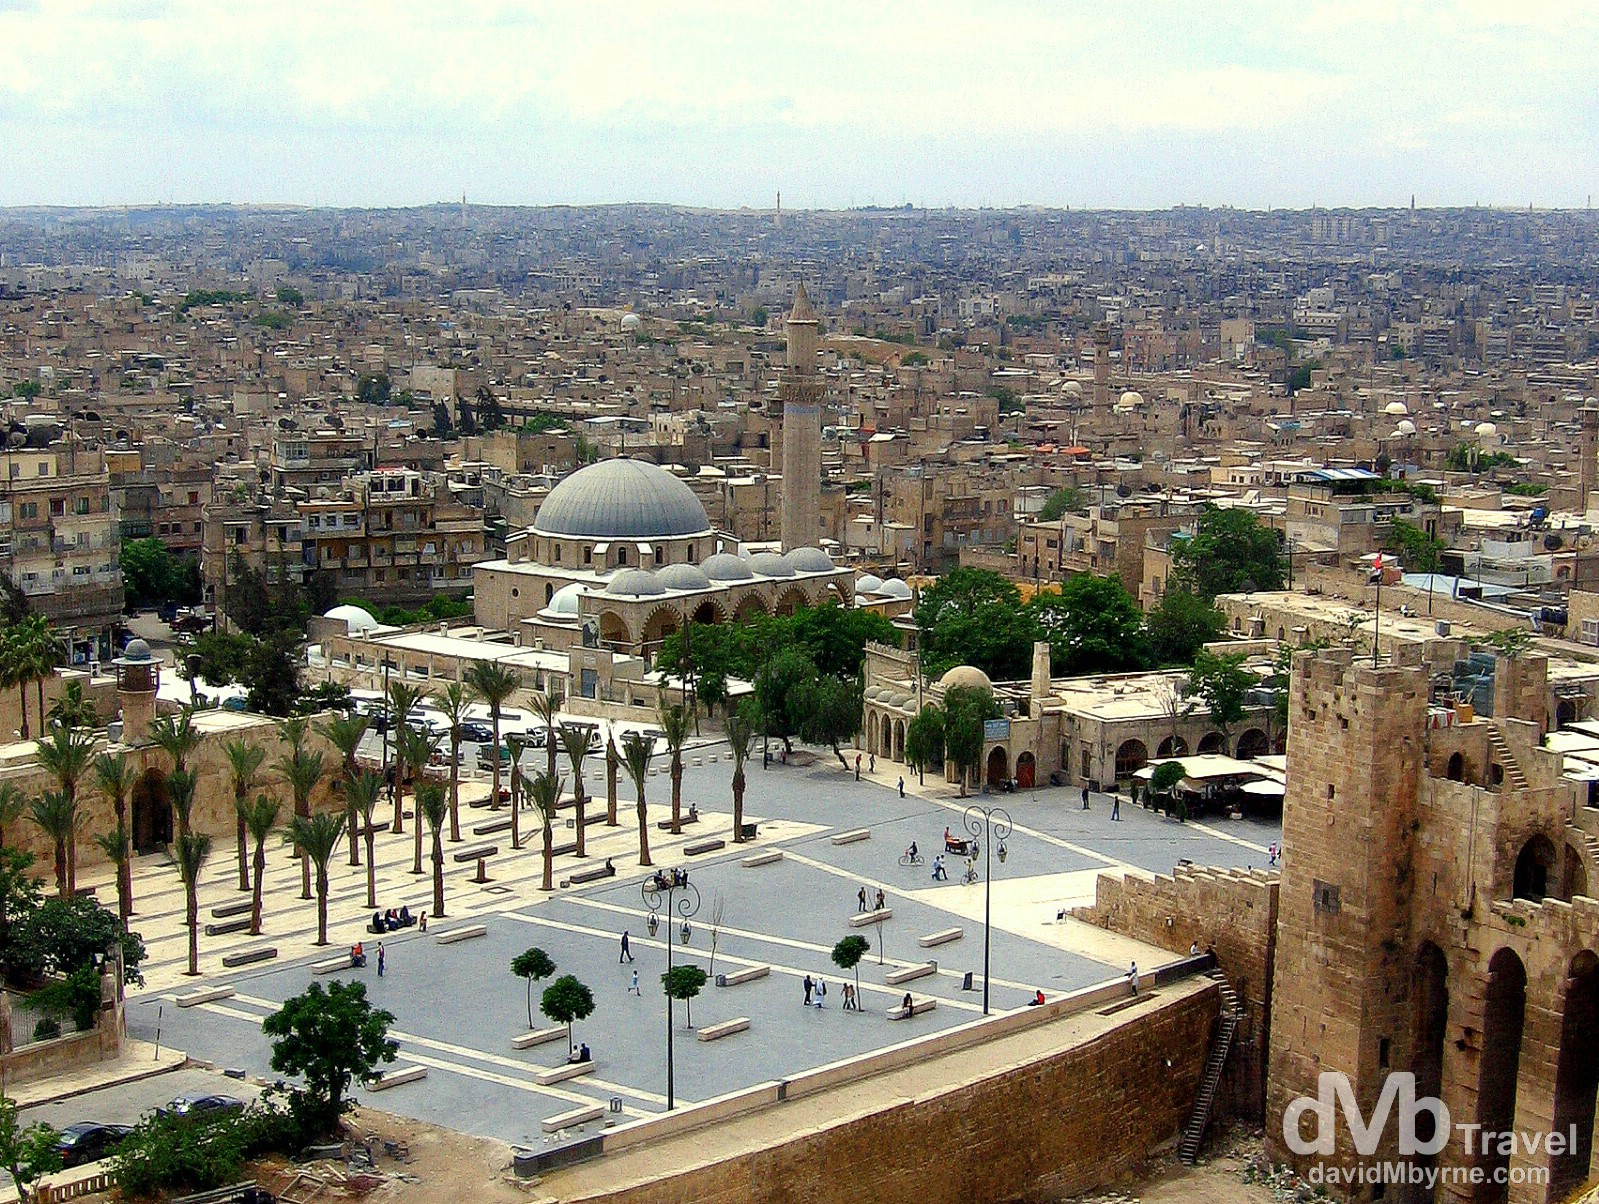 aleppo, syria - worldwide destination photography & insights